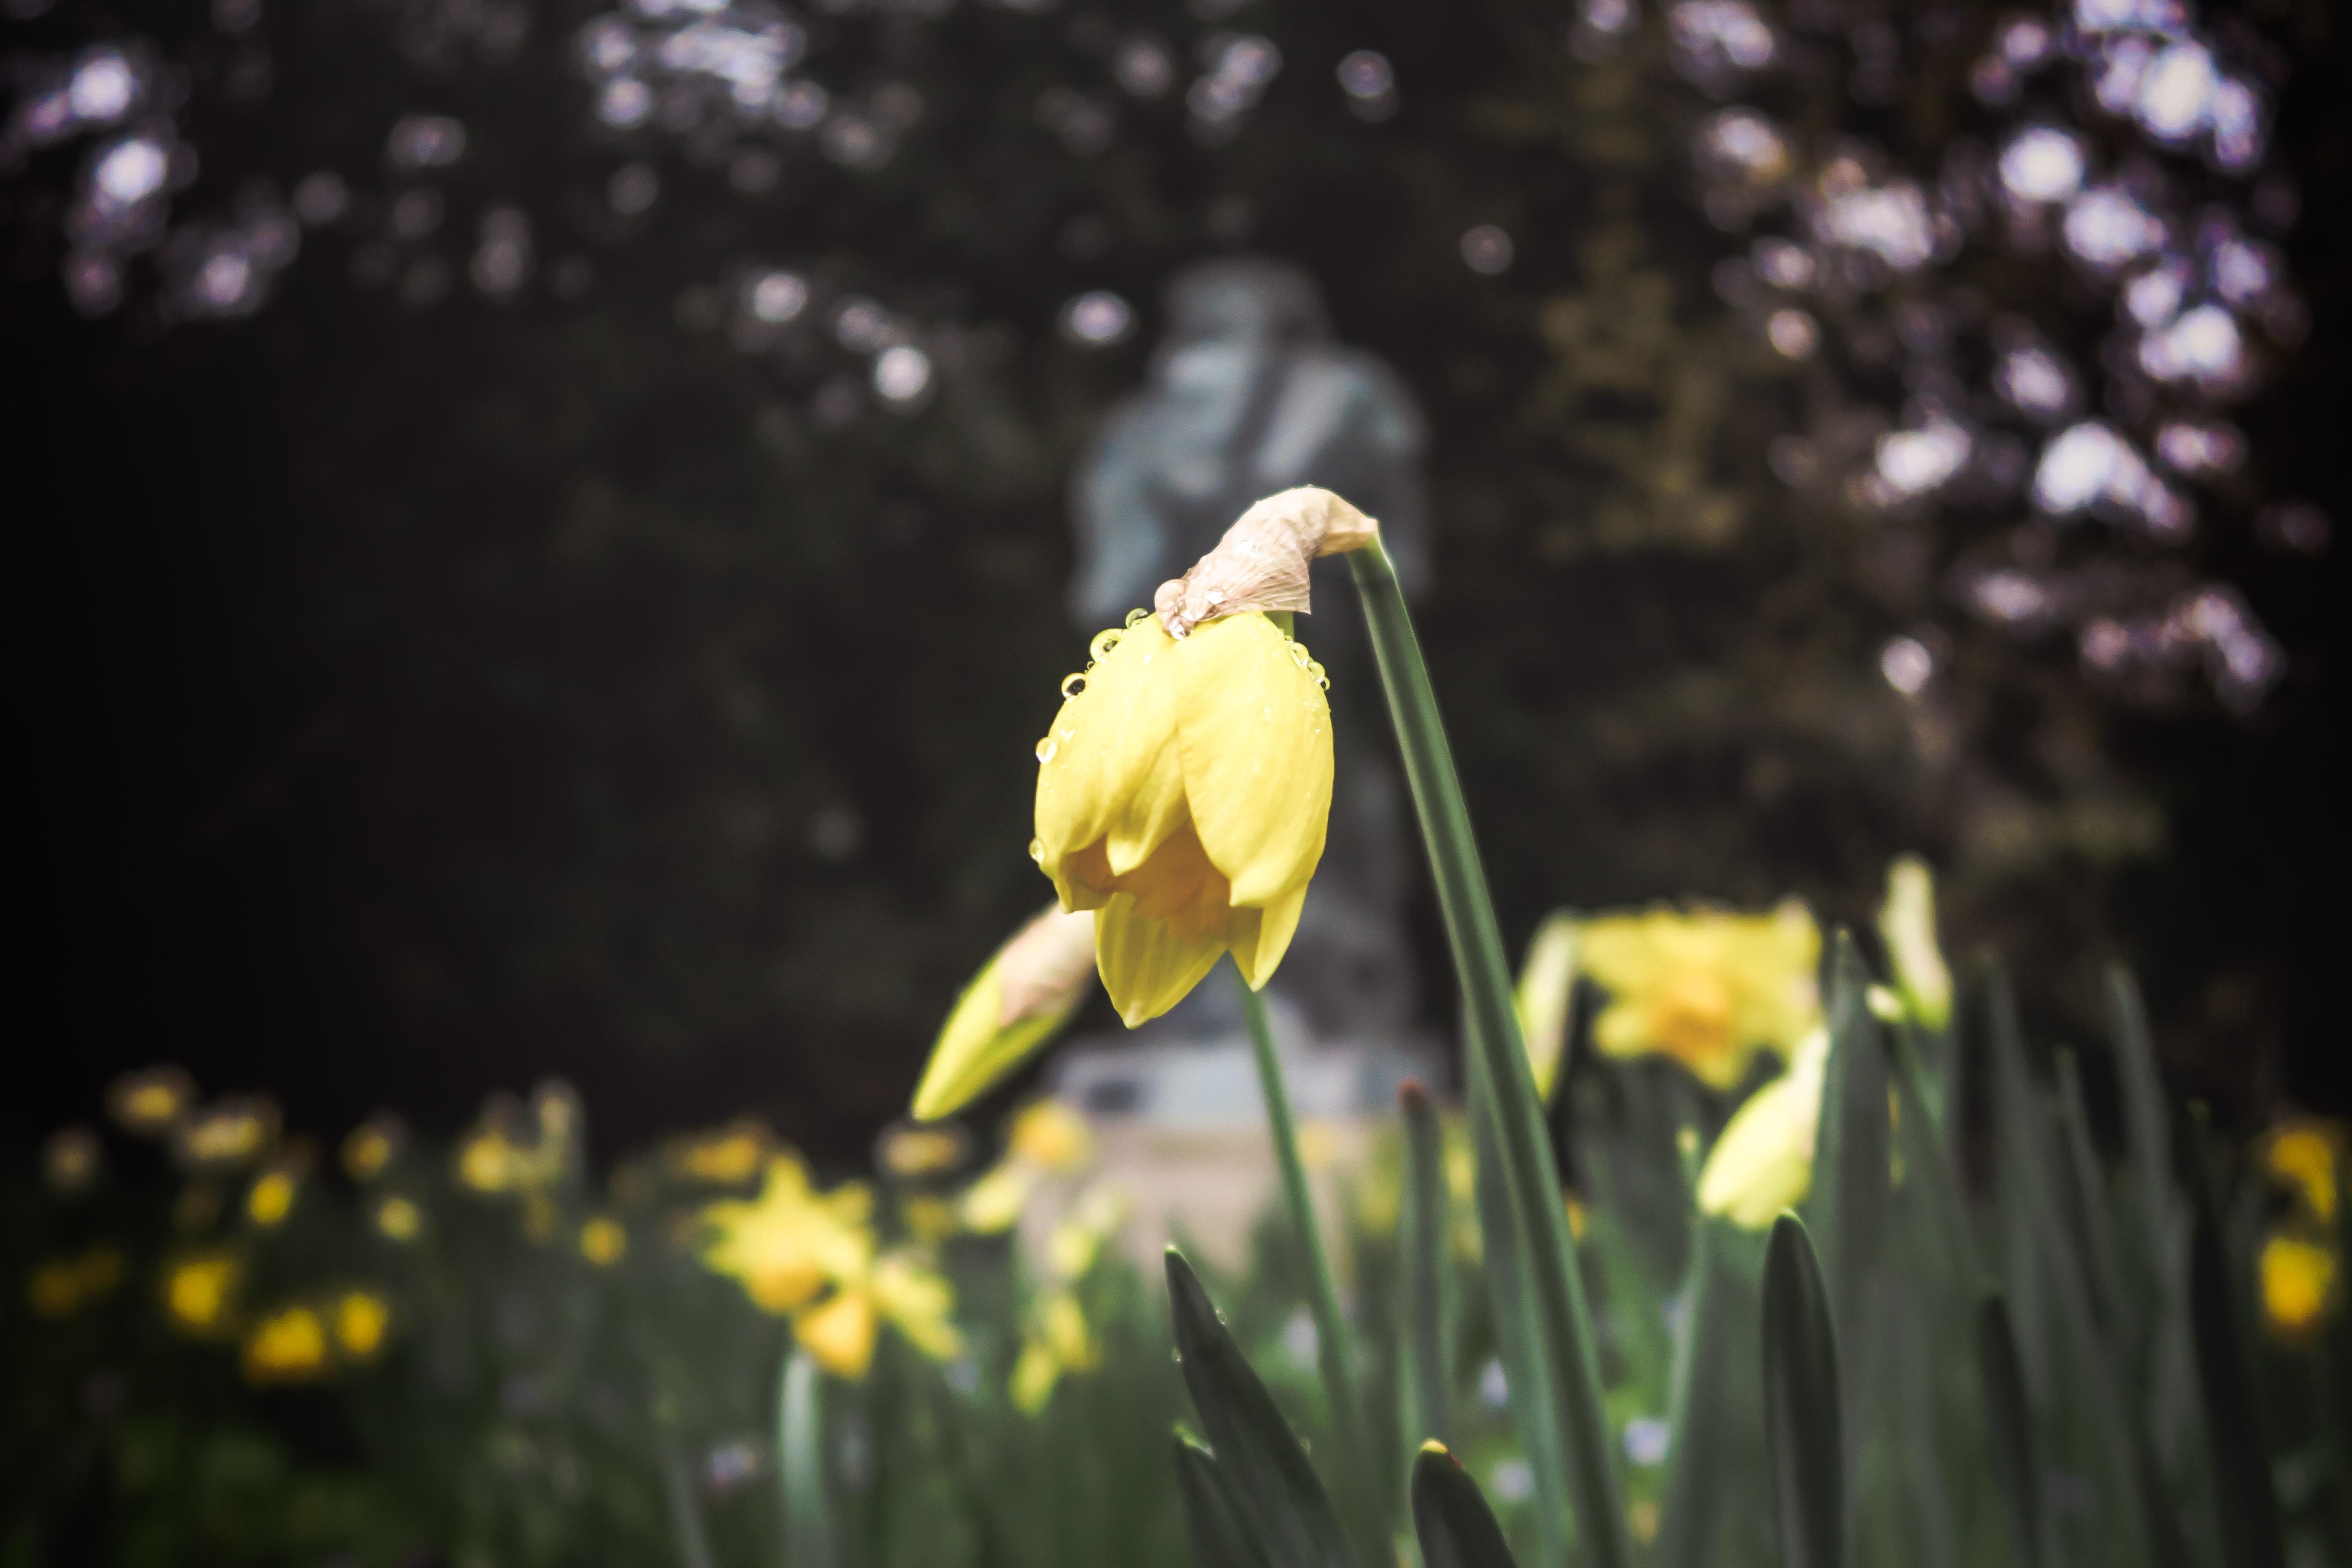 yellow flower focus photography